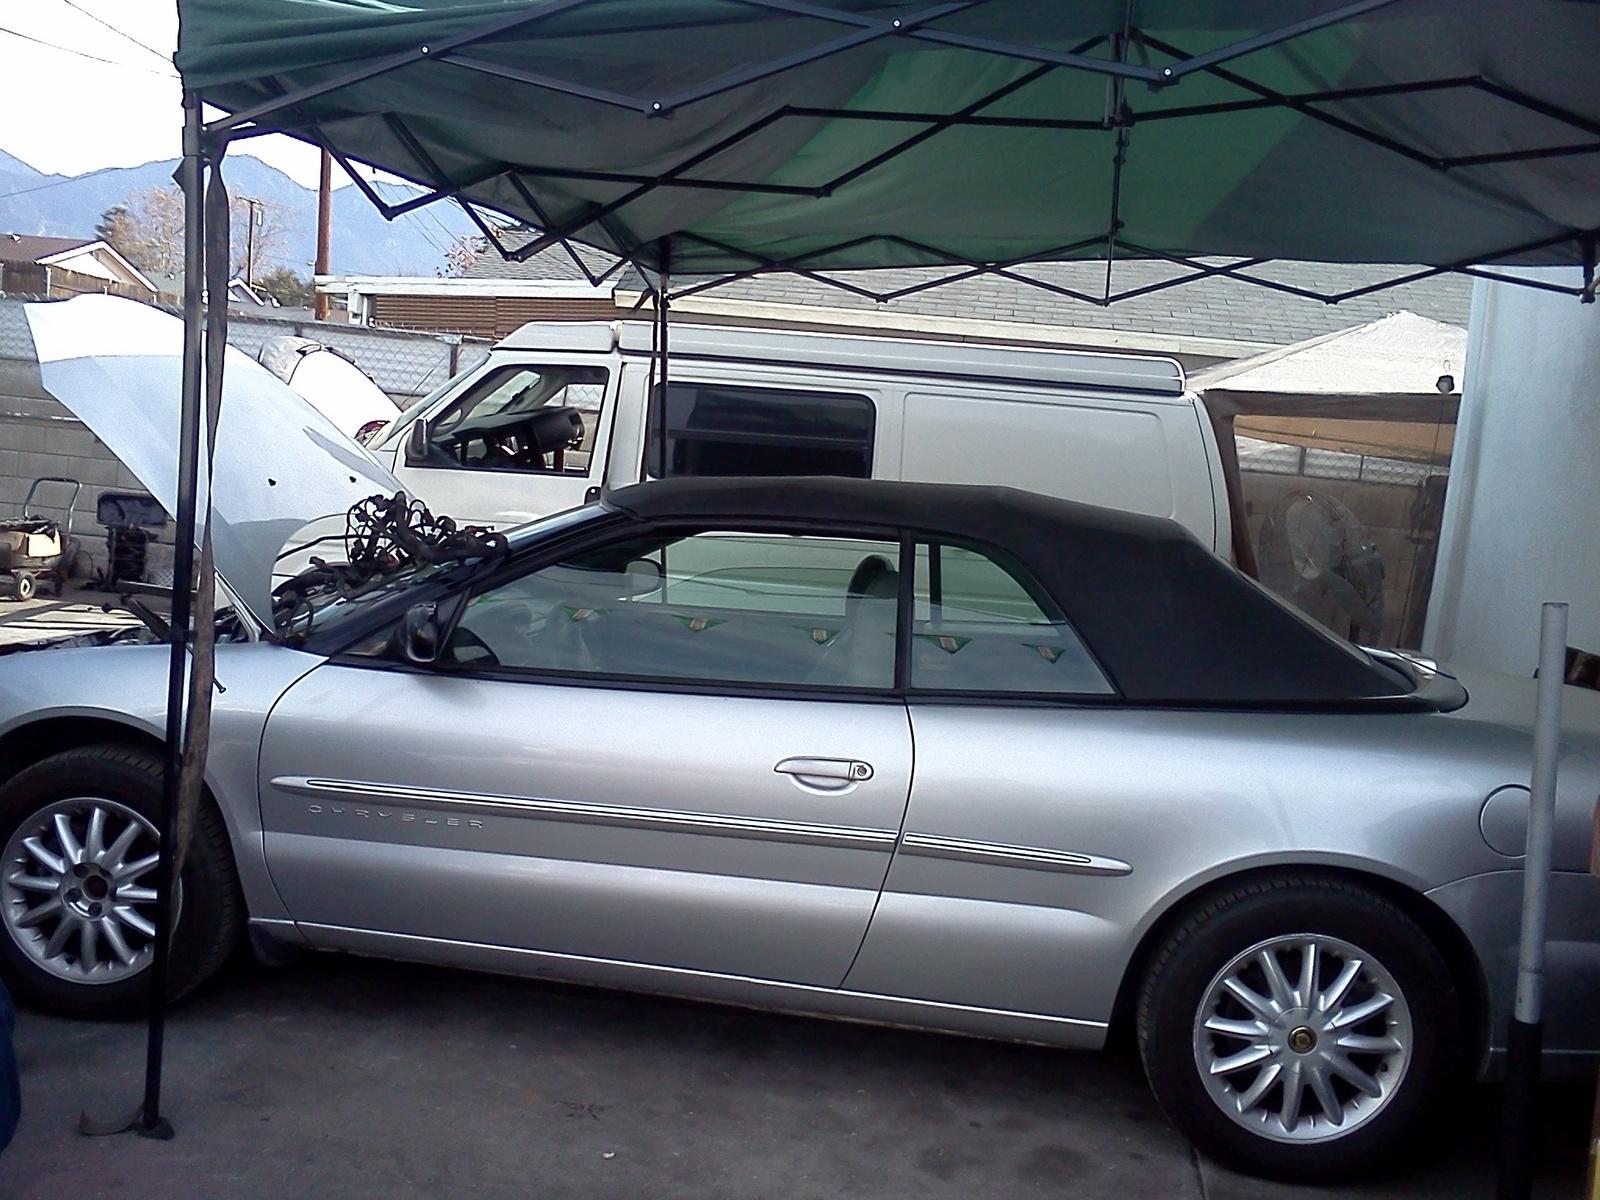 2008 chrysler sebring convertible top malfunction